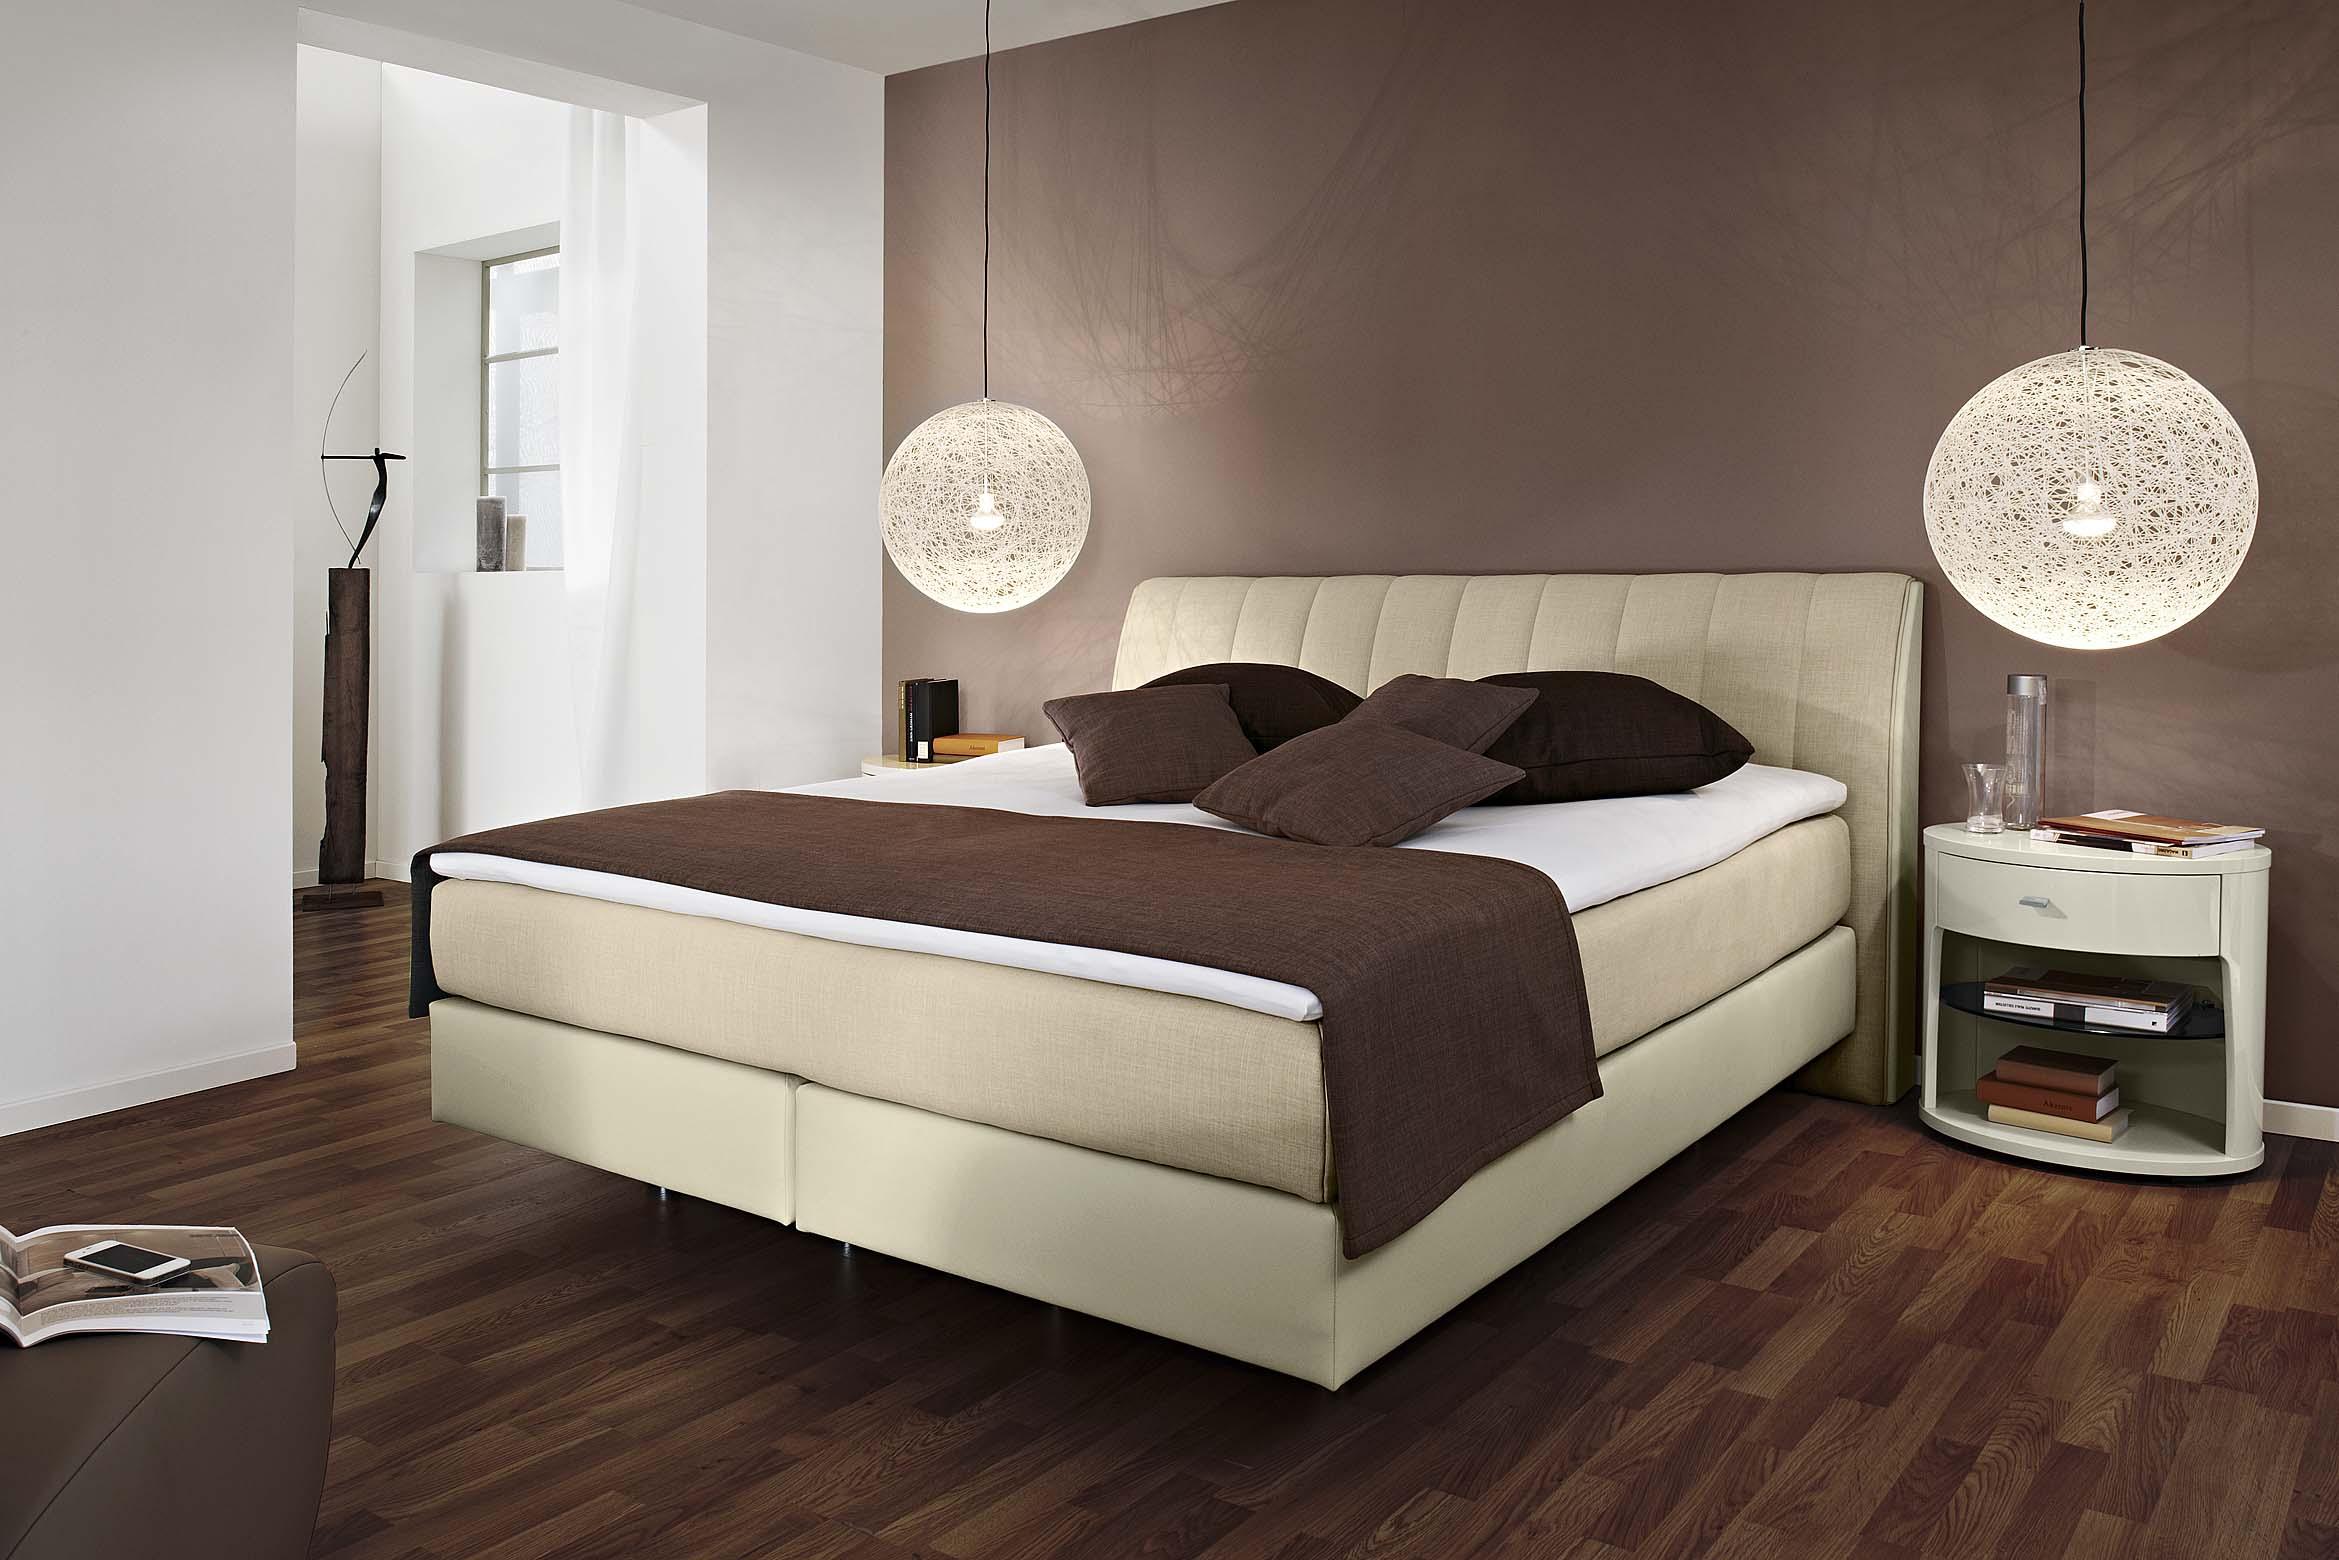 boxspringbetten interna m bel. Black Bedroom Furniture Sets. Home Design Ideas